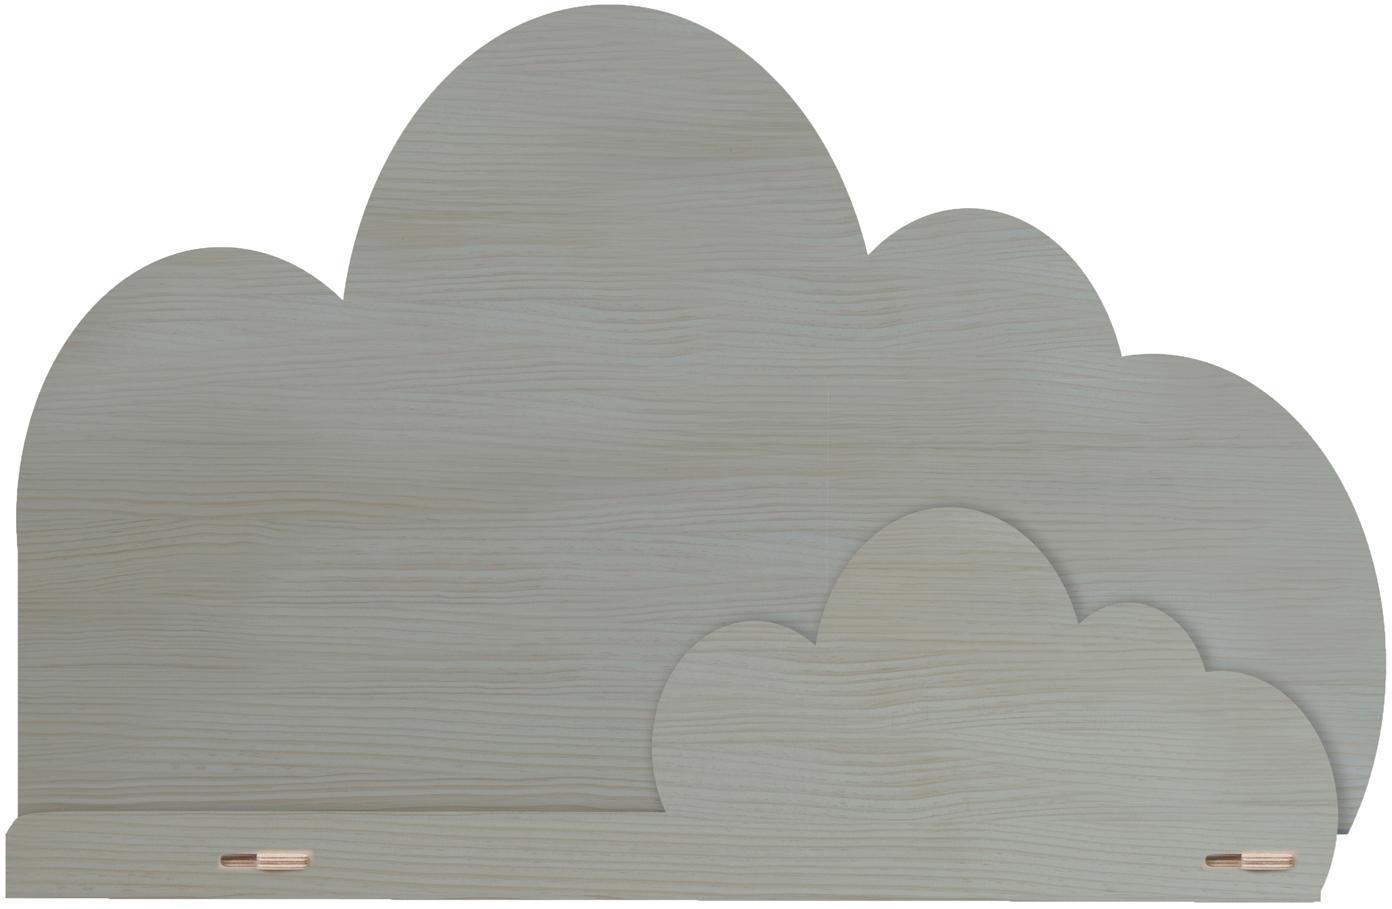 Estante de pared Cloud, Madera contrachapada, recubierta, Gris, An 45 x Al 30 cm